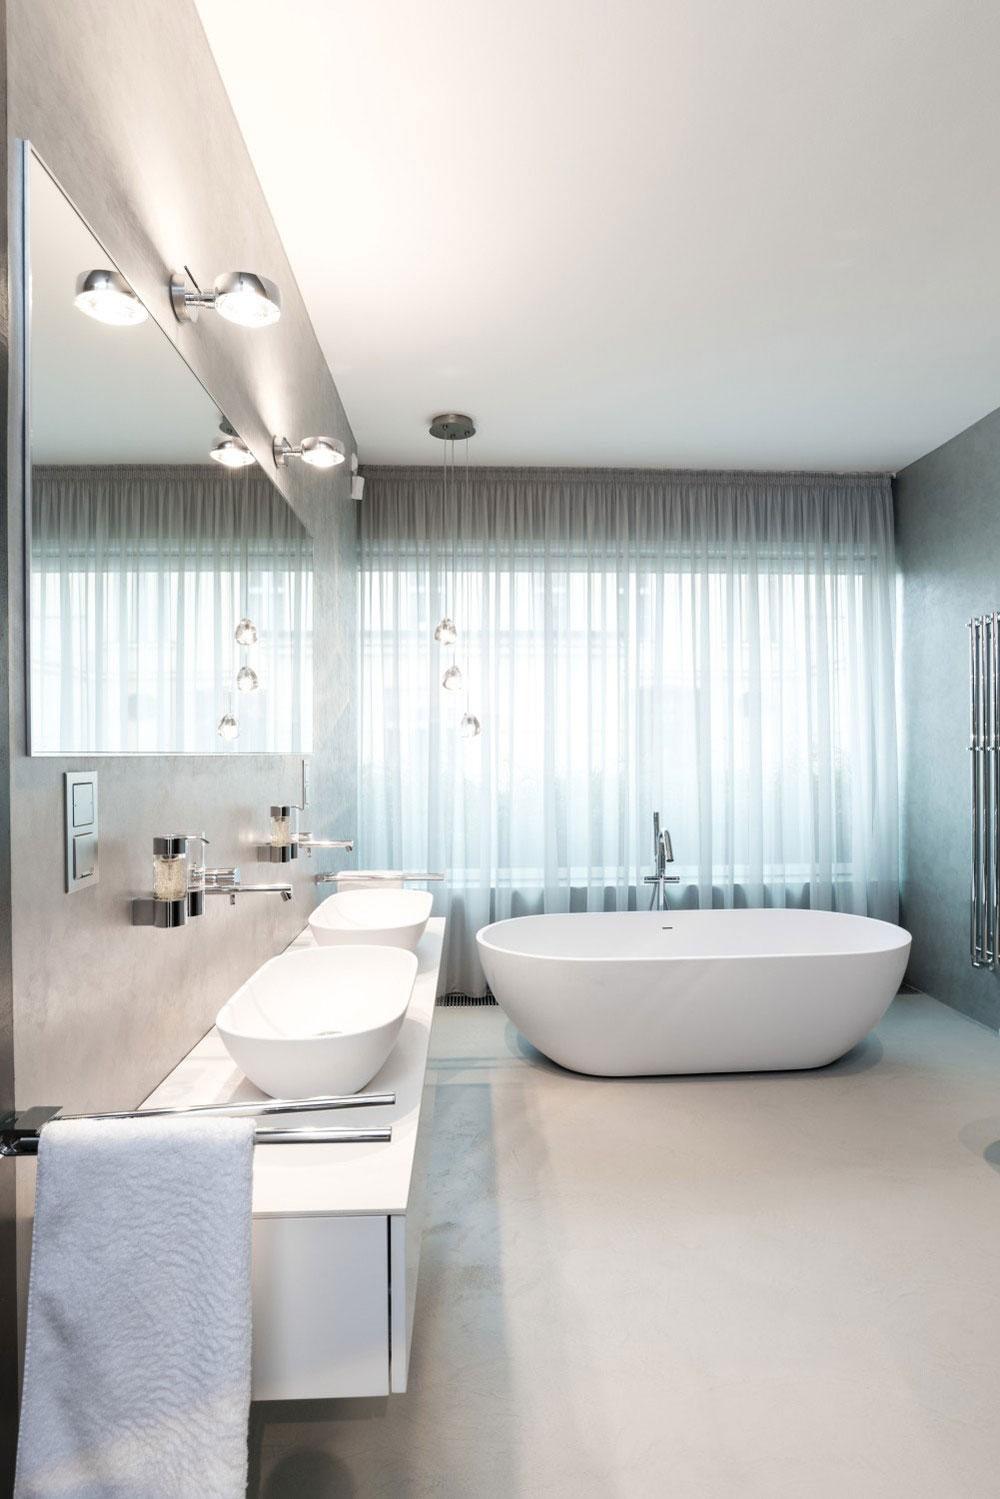 Senaste-badrum-interiör-design-exempel-3 Senaste-badrum-interiör-design-exempel